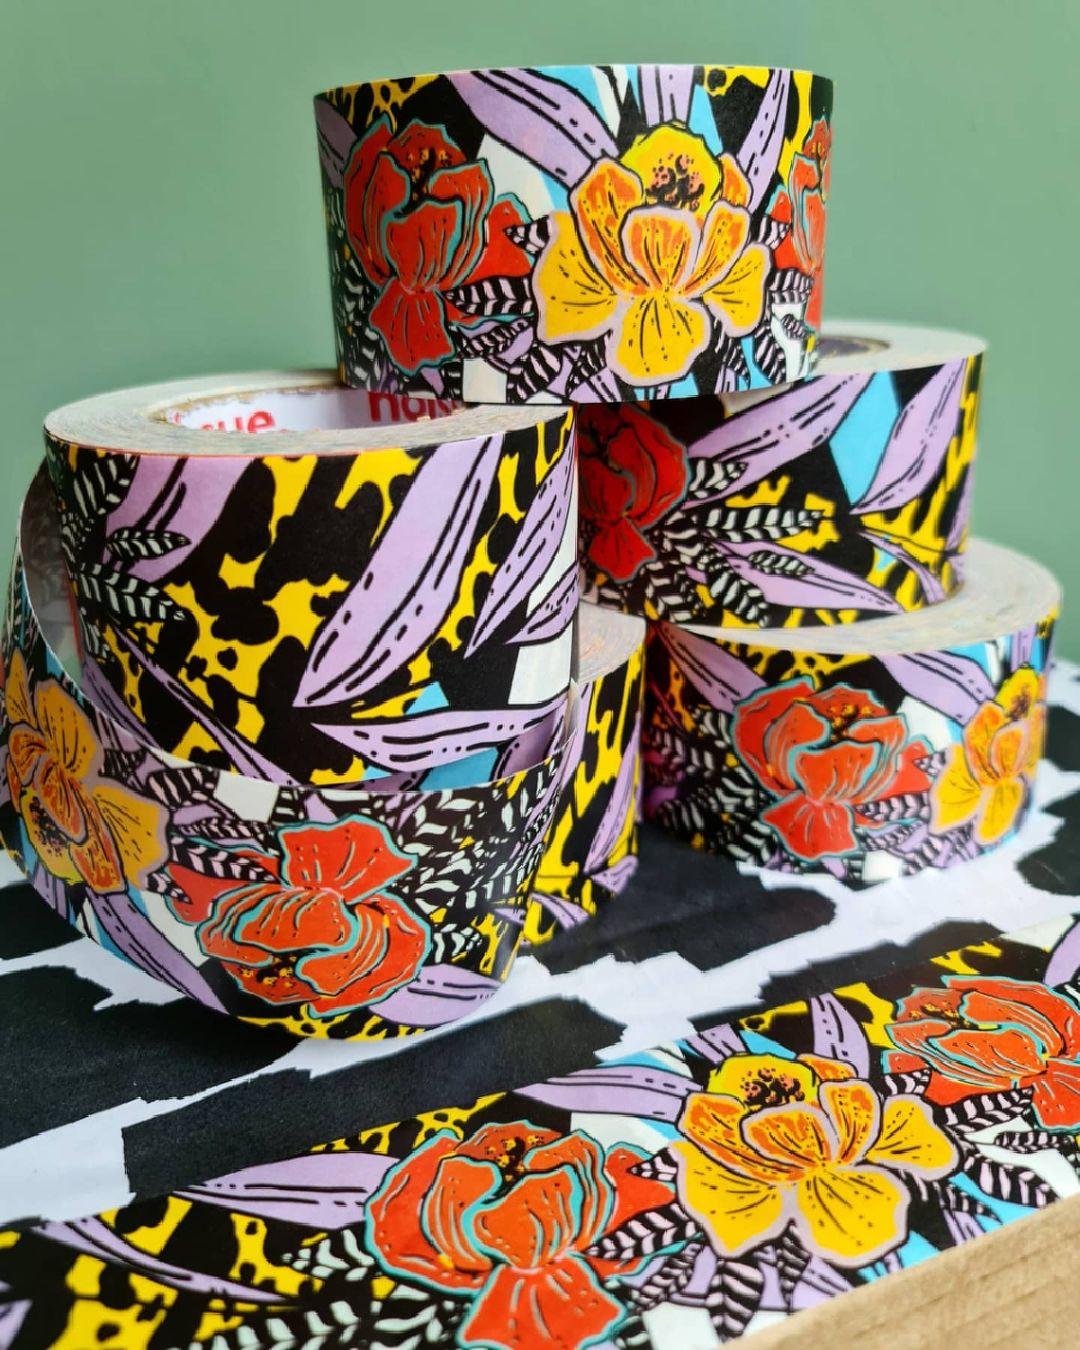 Rolls of custom tape